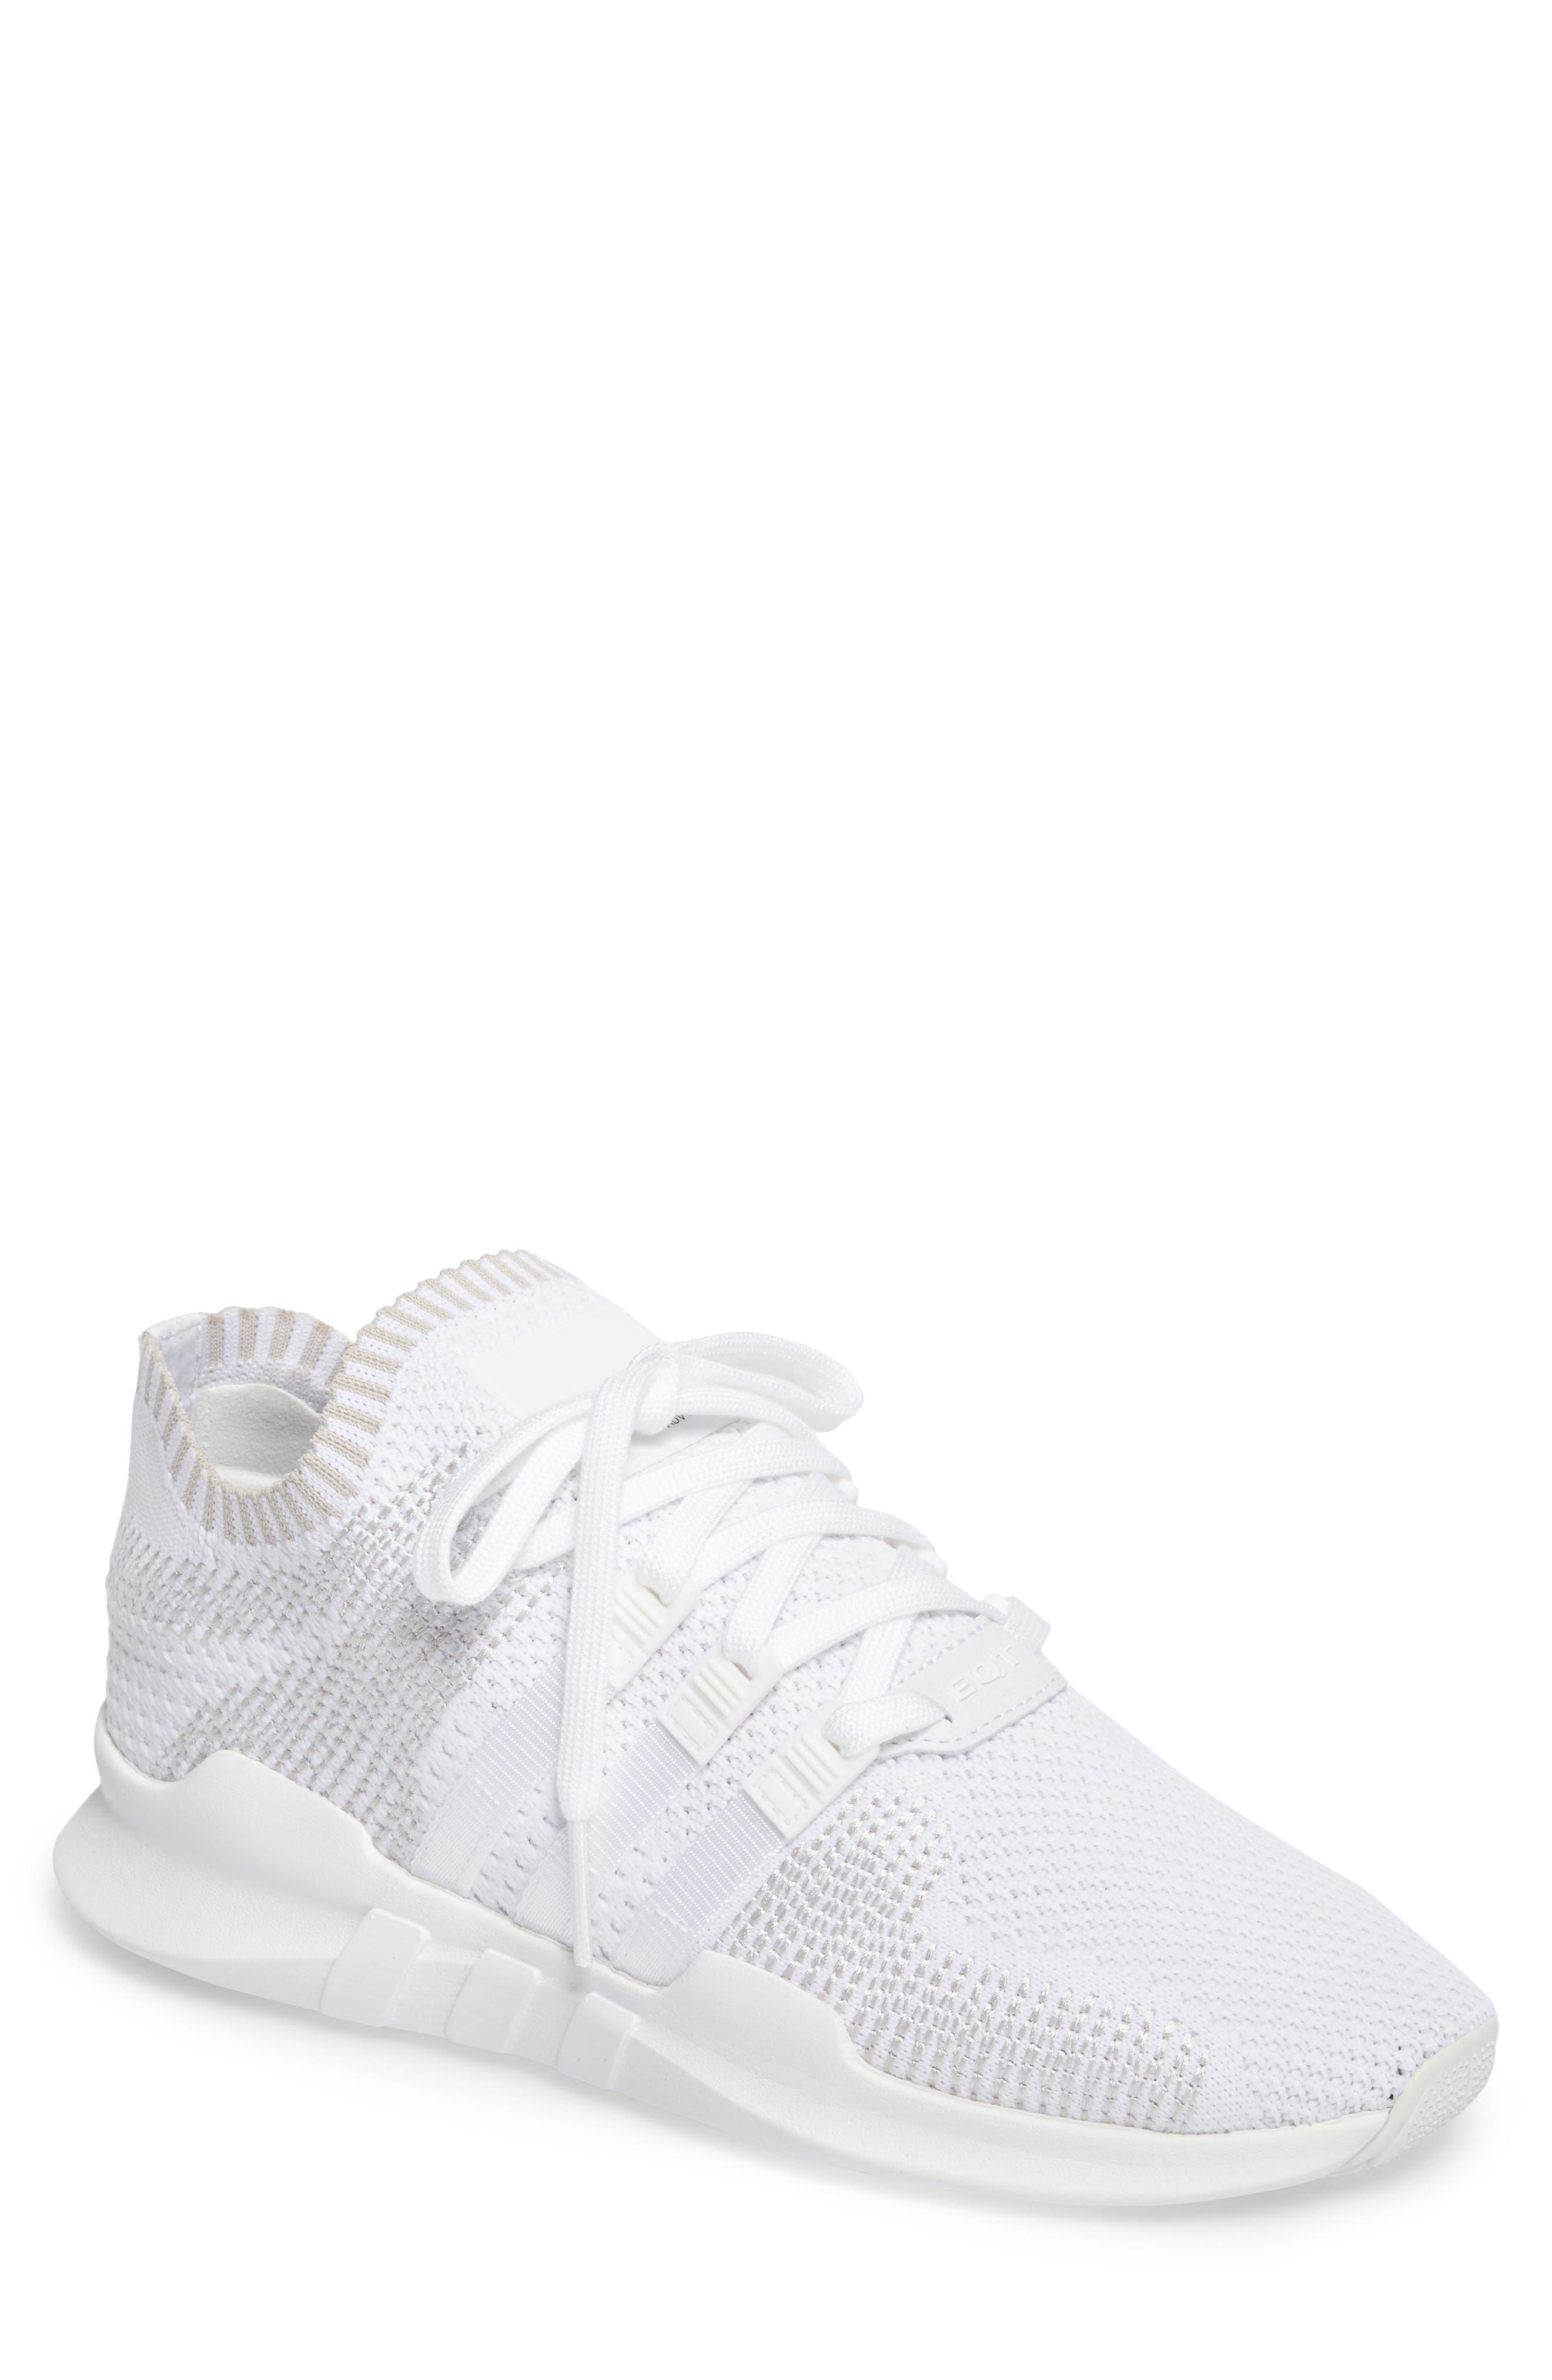 EQT Support ADV PrimeKnit Sneaker,                         Main,                         color, White/ White/ Sub Green